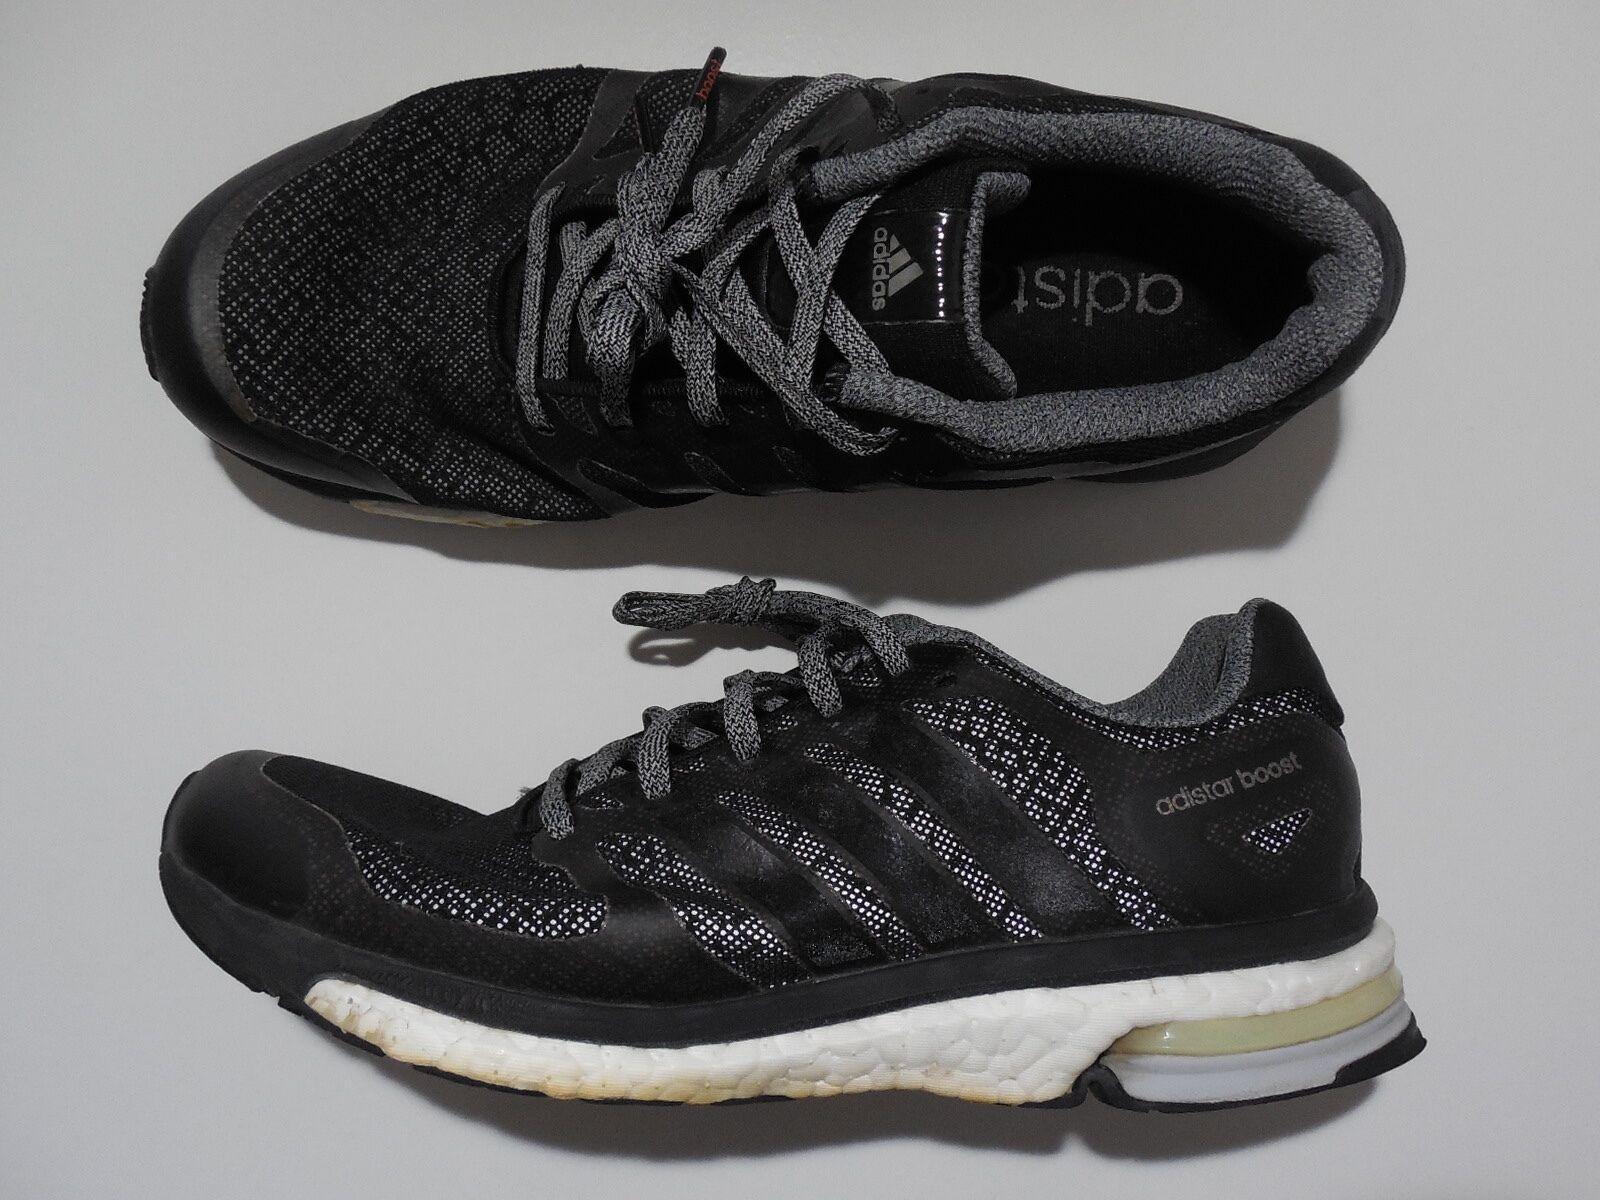 Adidas Adistar Boost M Glow 8.5 Mens Athletic Runining shoes Black Reflective